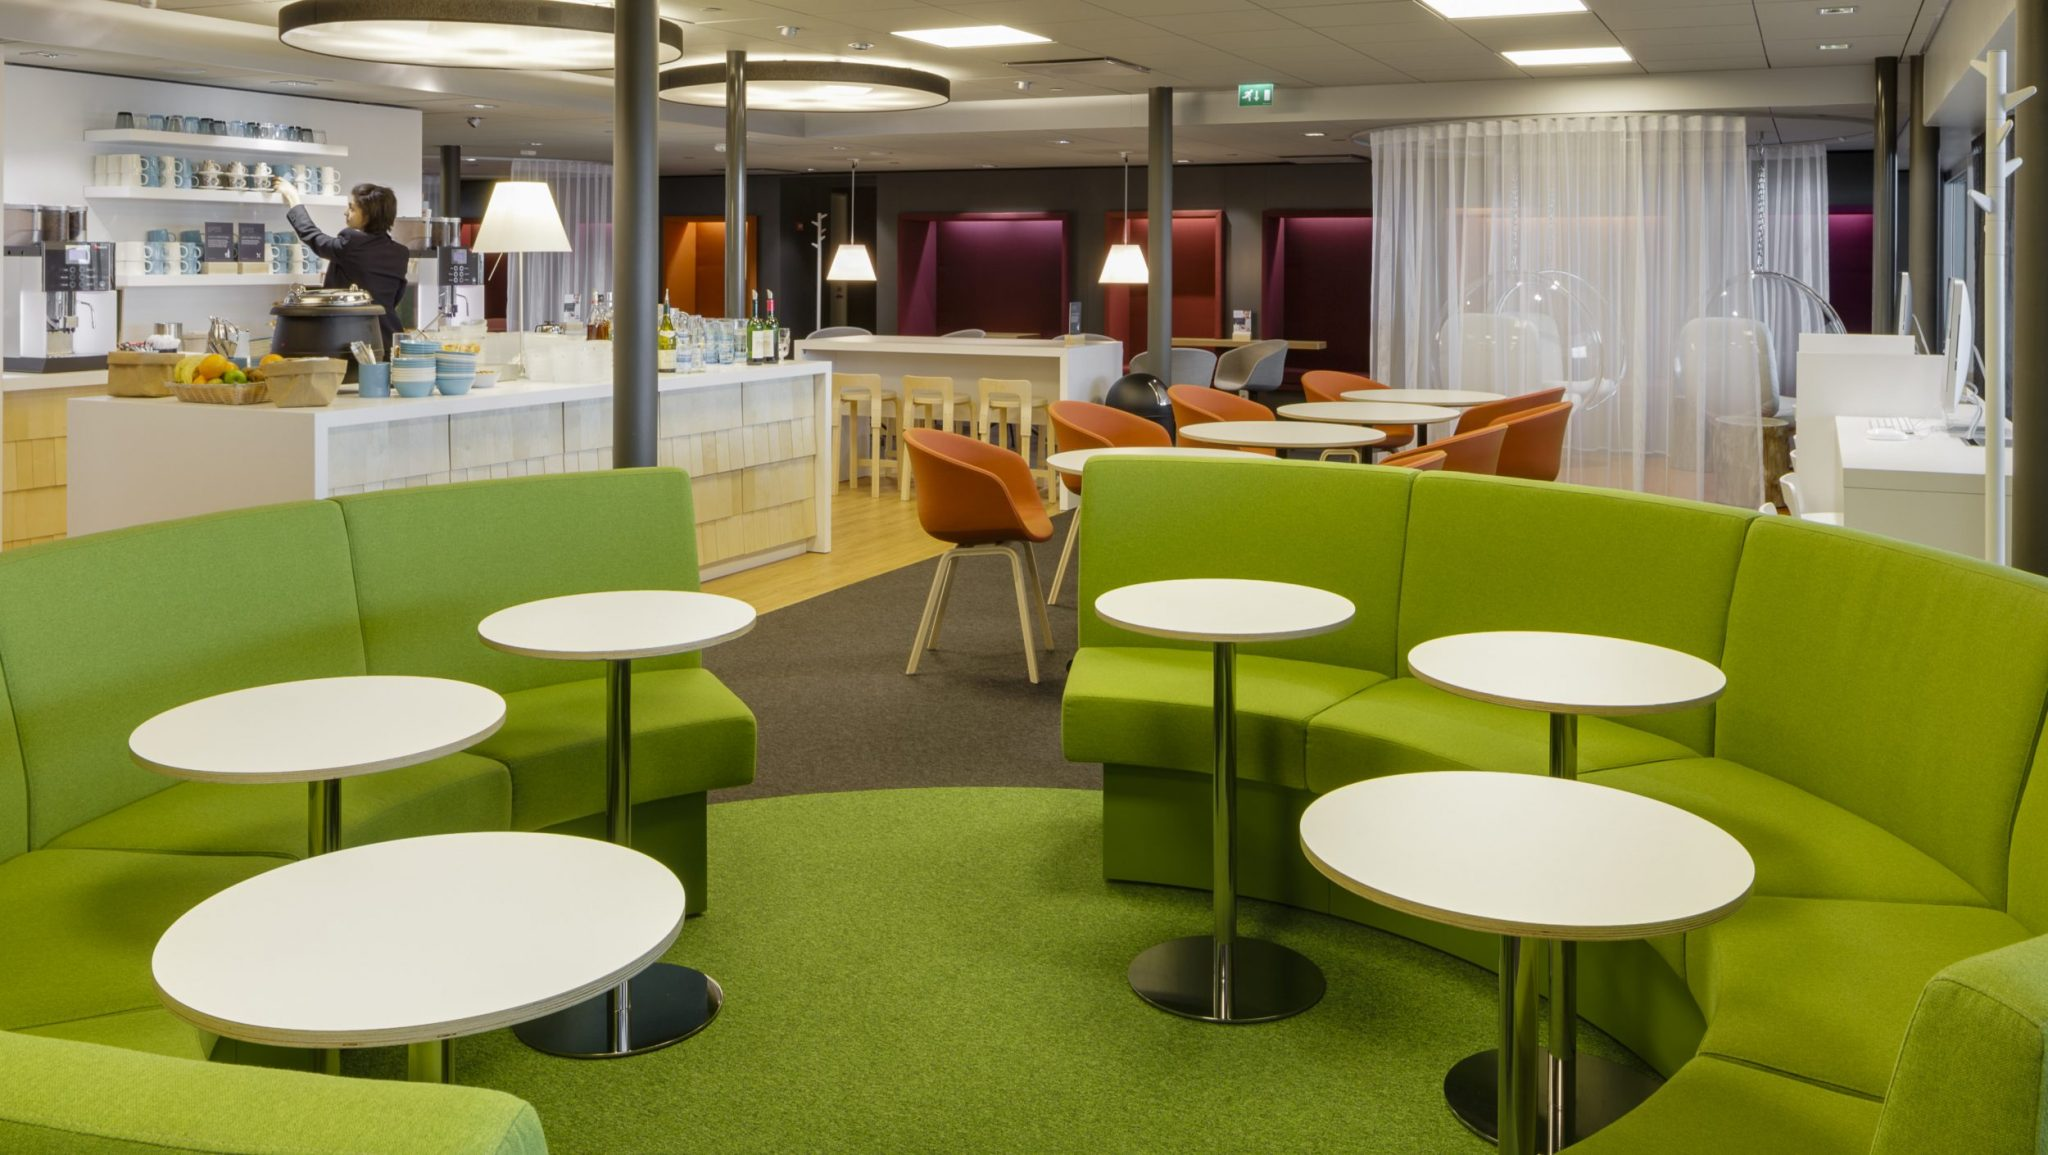 Servisair-Aspire-Airport-Lounge-Helsinki-Vantaa-GI-Project-1